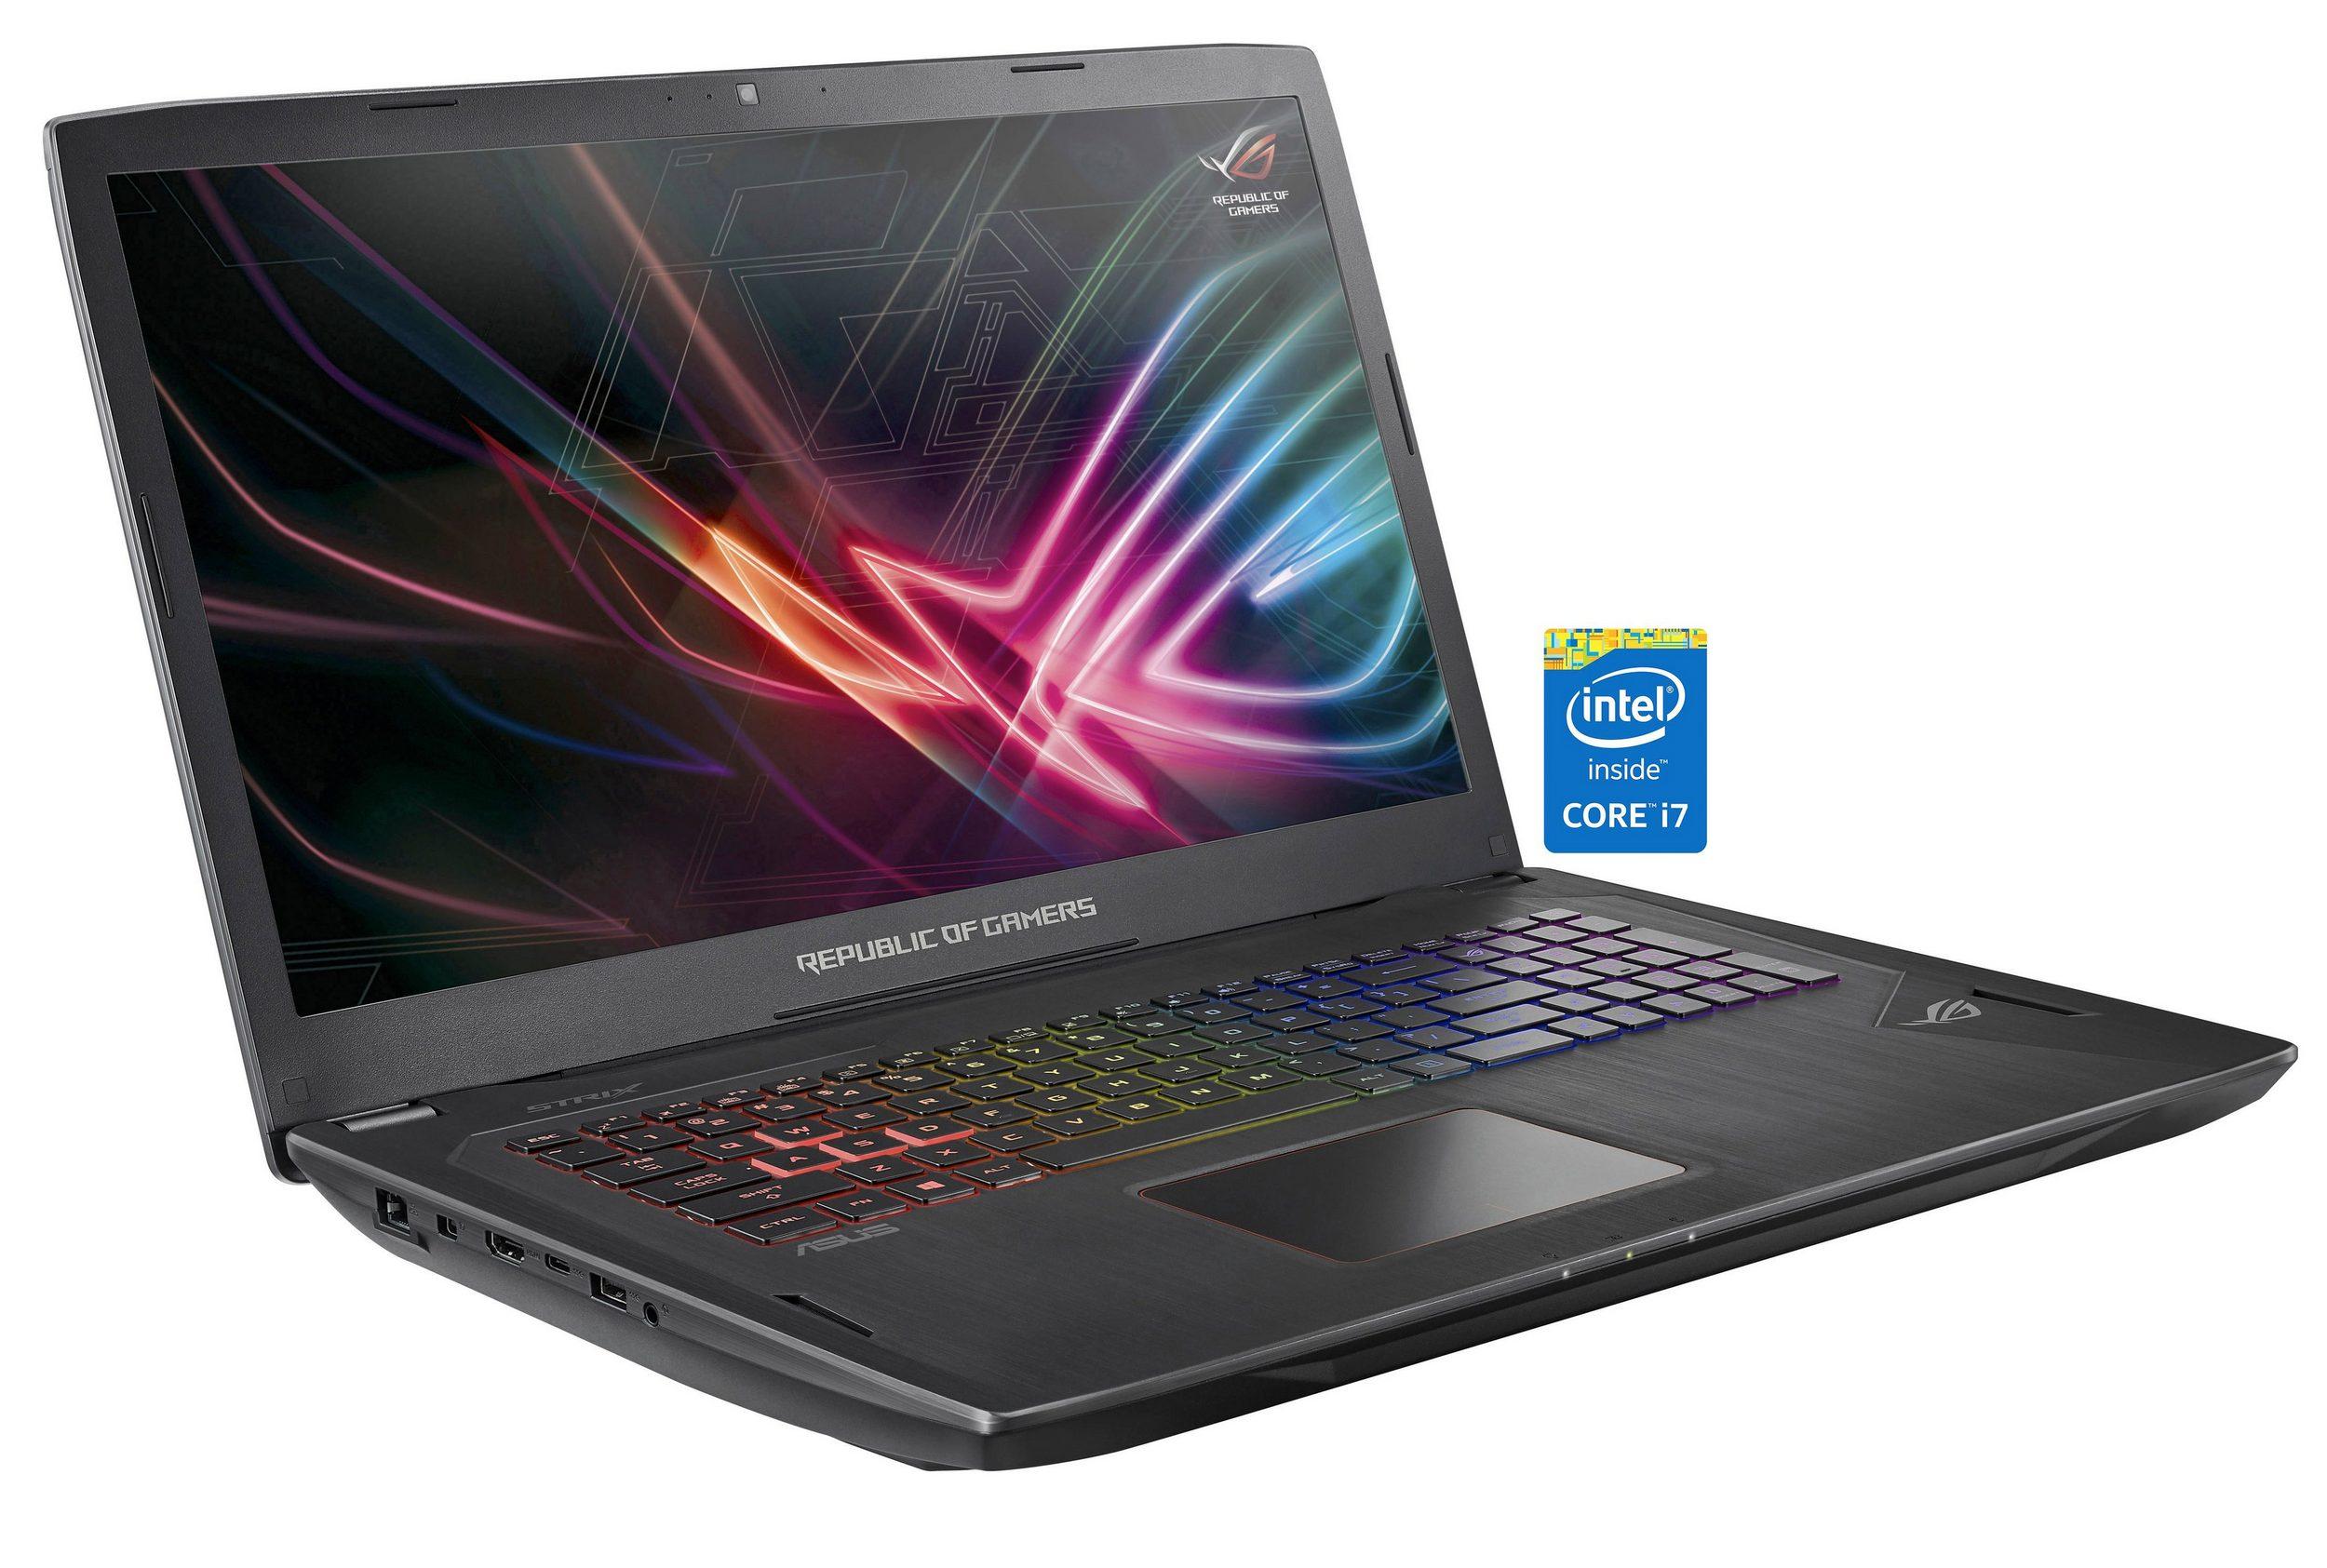 "ASUS GL702VI-BA007T Gaming Notebook 17,3"" FHD 120Hz G-Sync, i7-7700HQ, 16GB RAM, 1TB HDD + 256GB M.2 SSD, GTX 1080, Win10 ( für 1511 / 1532 EUR möglich durch Neu-/Bestandskundenrabatt)  [Otto]"